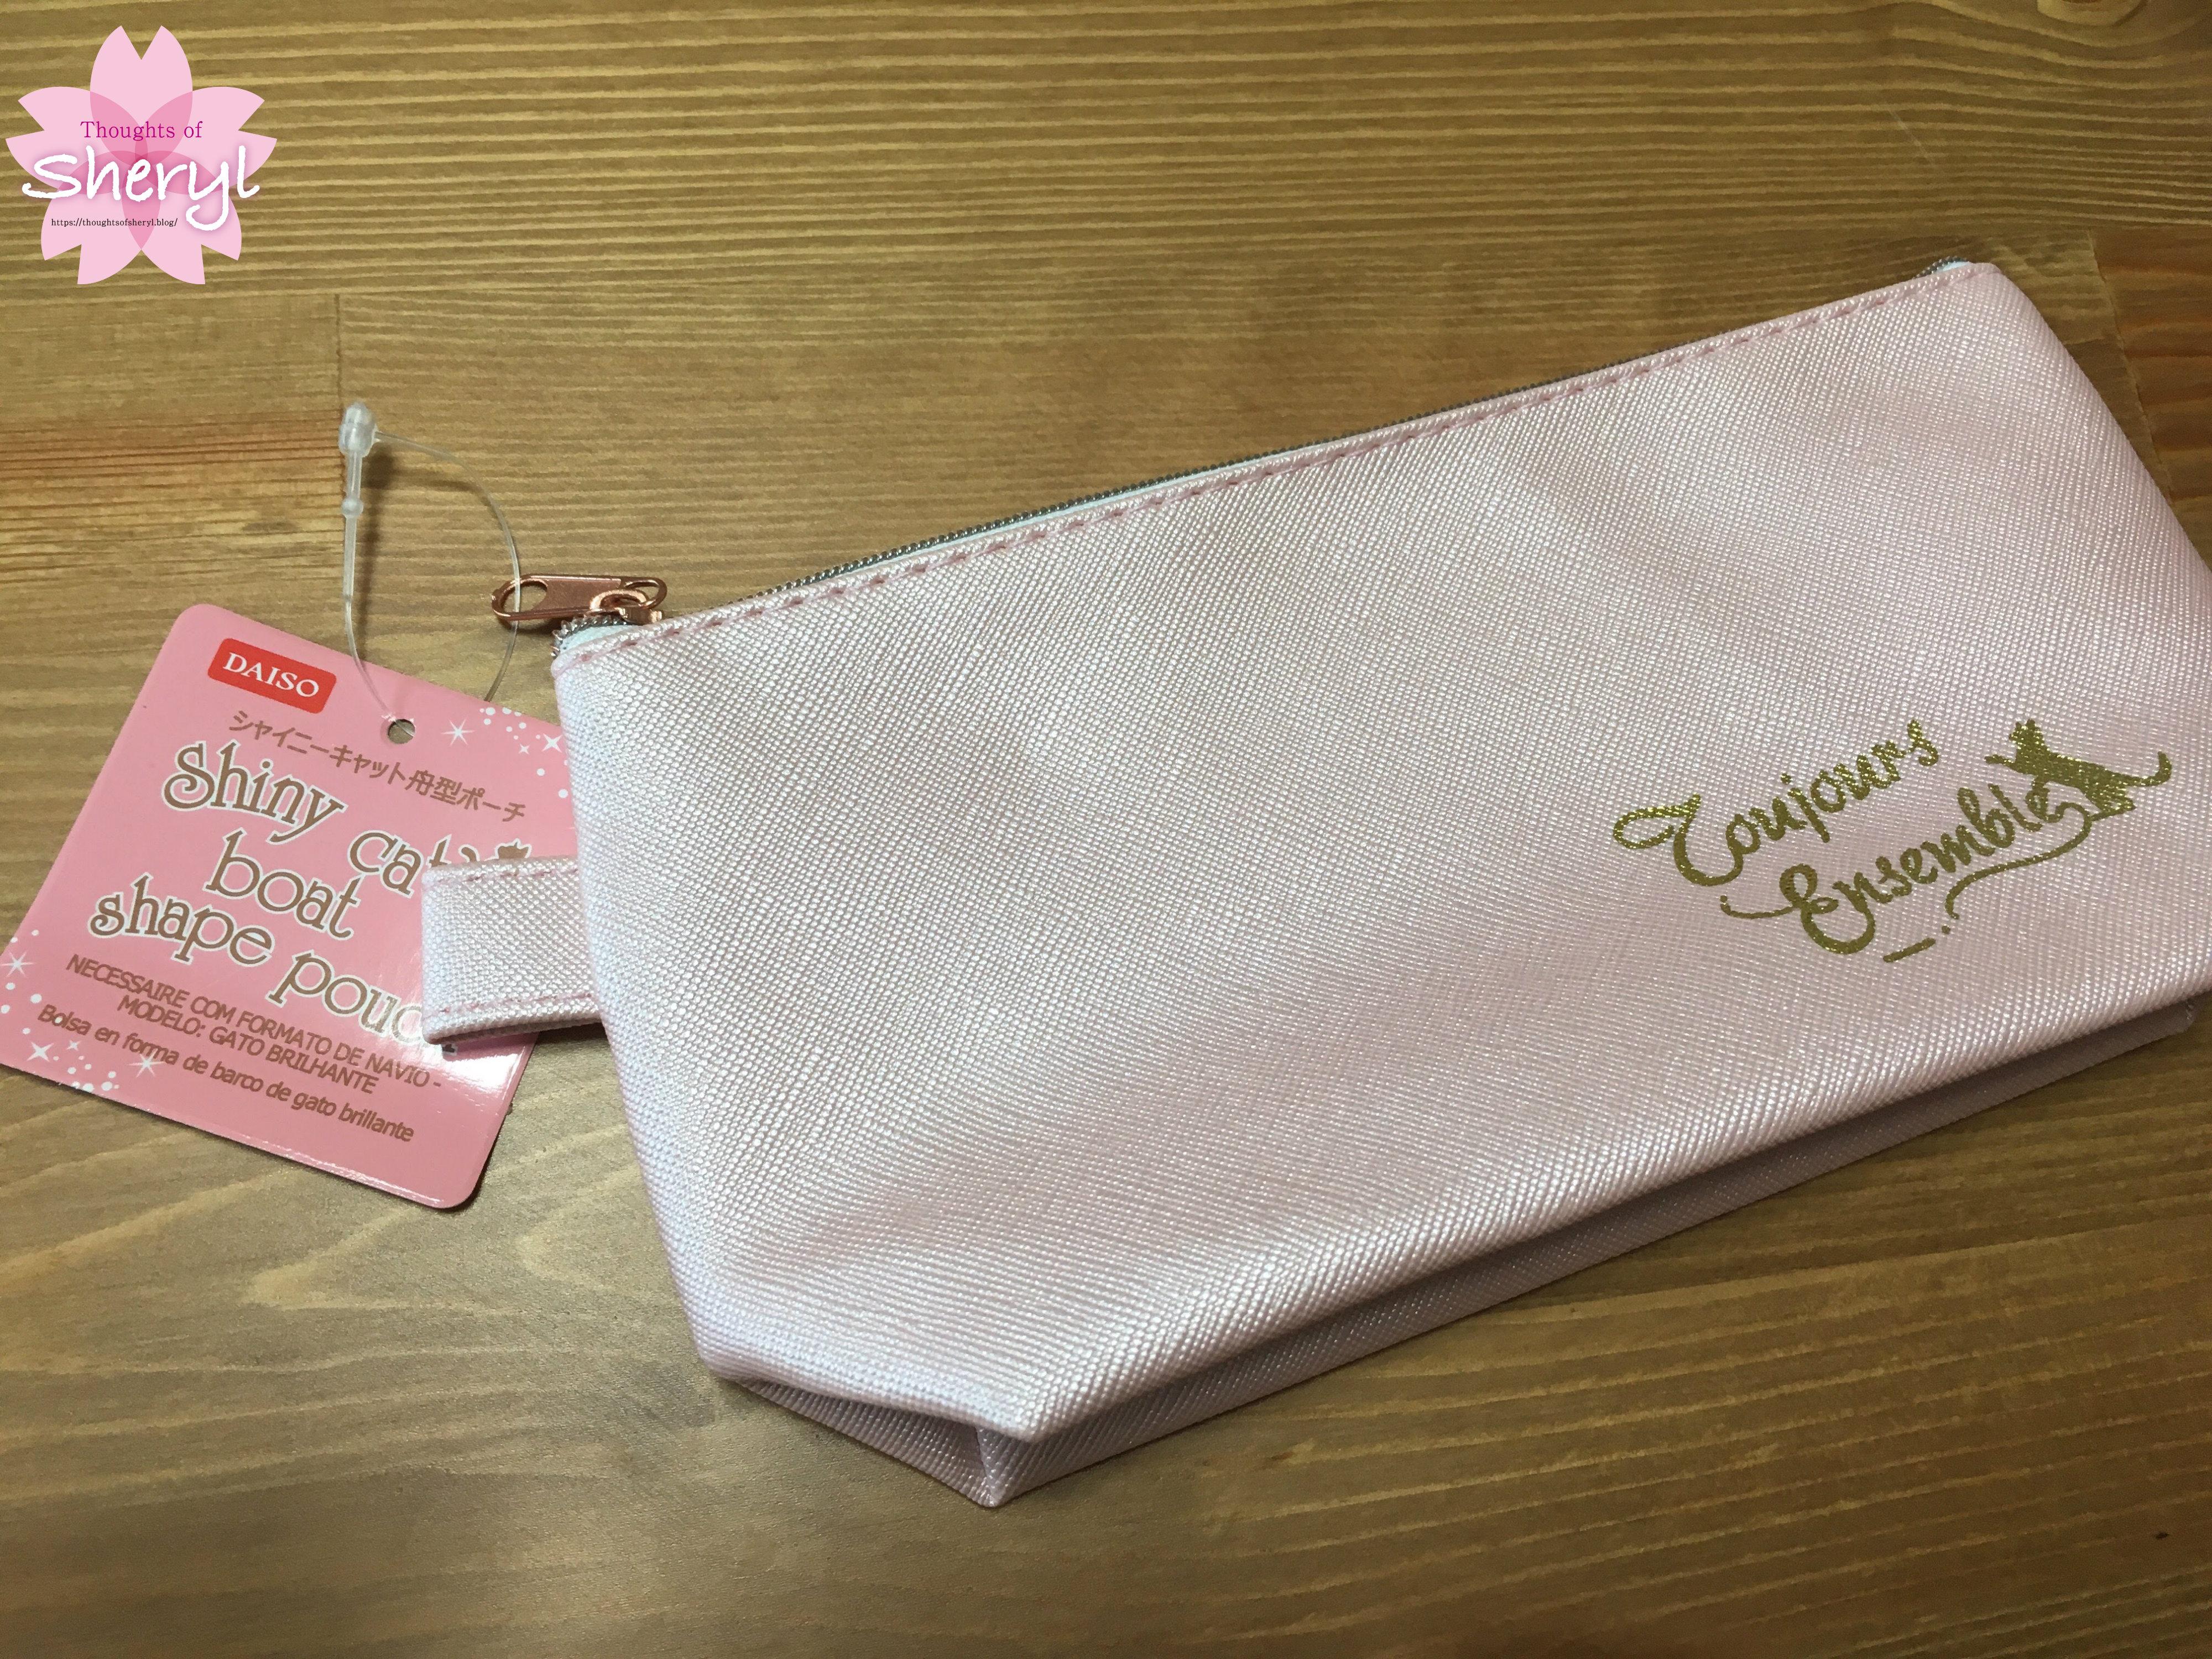 daiso makeup pouch